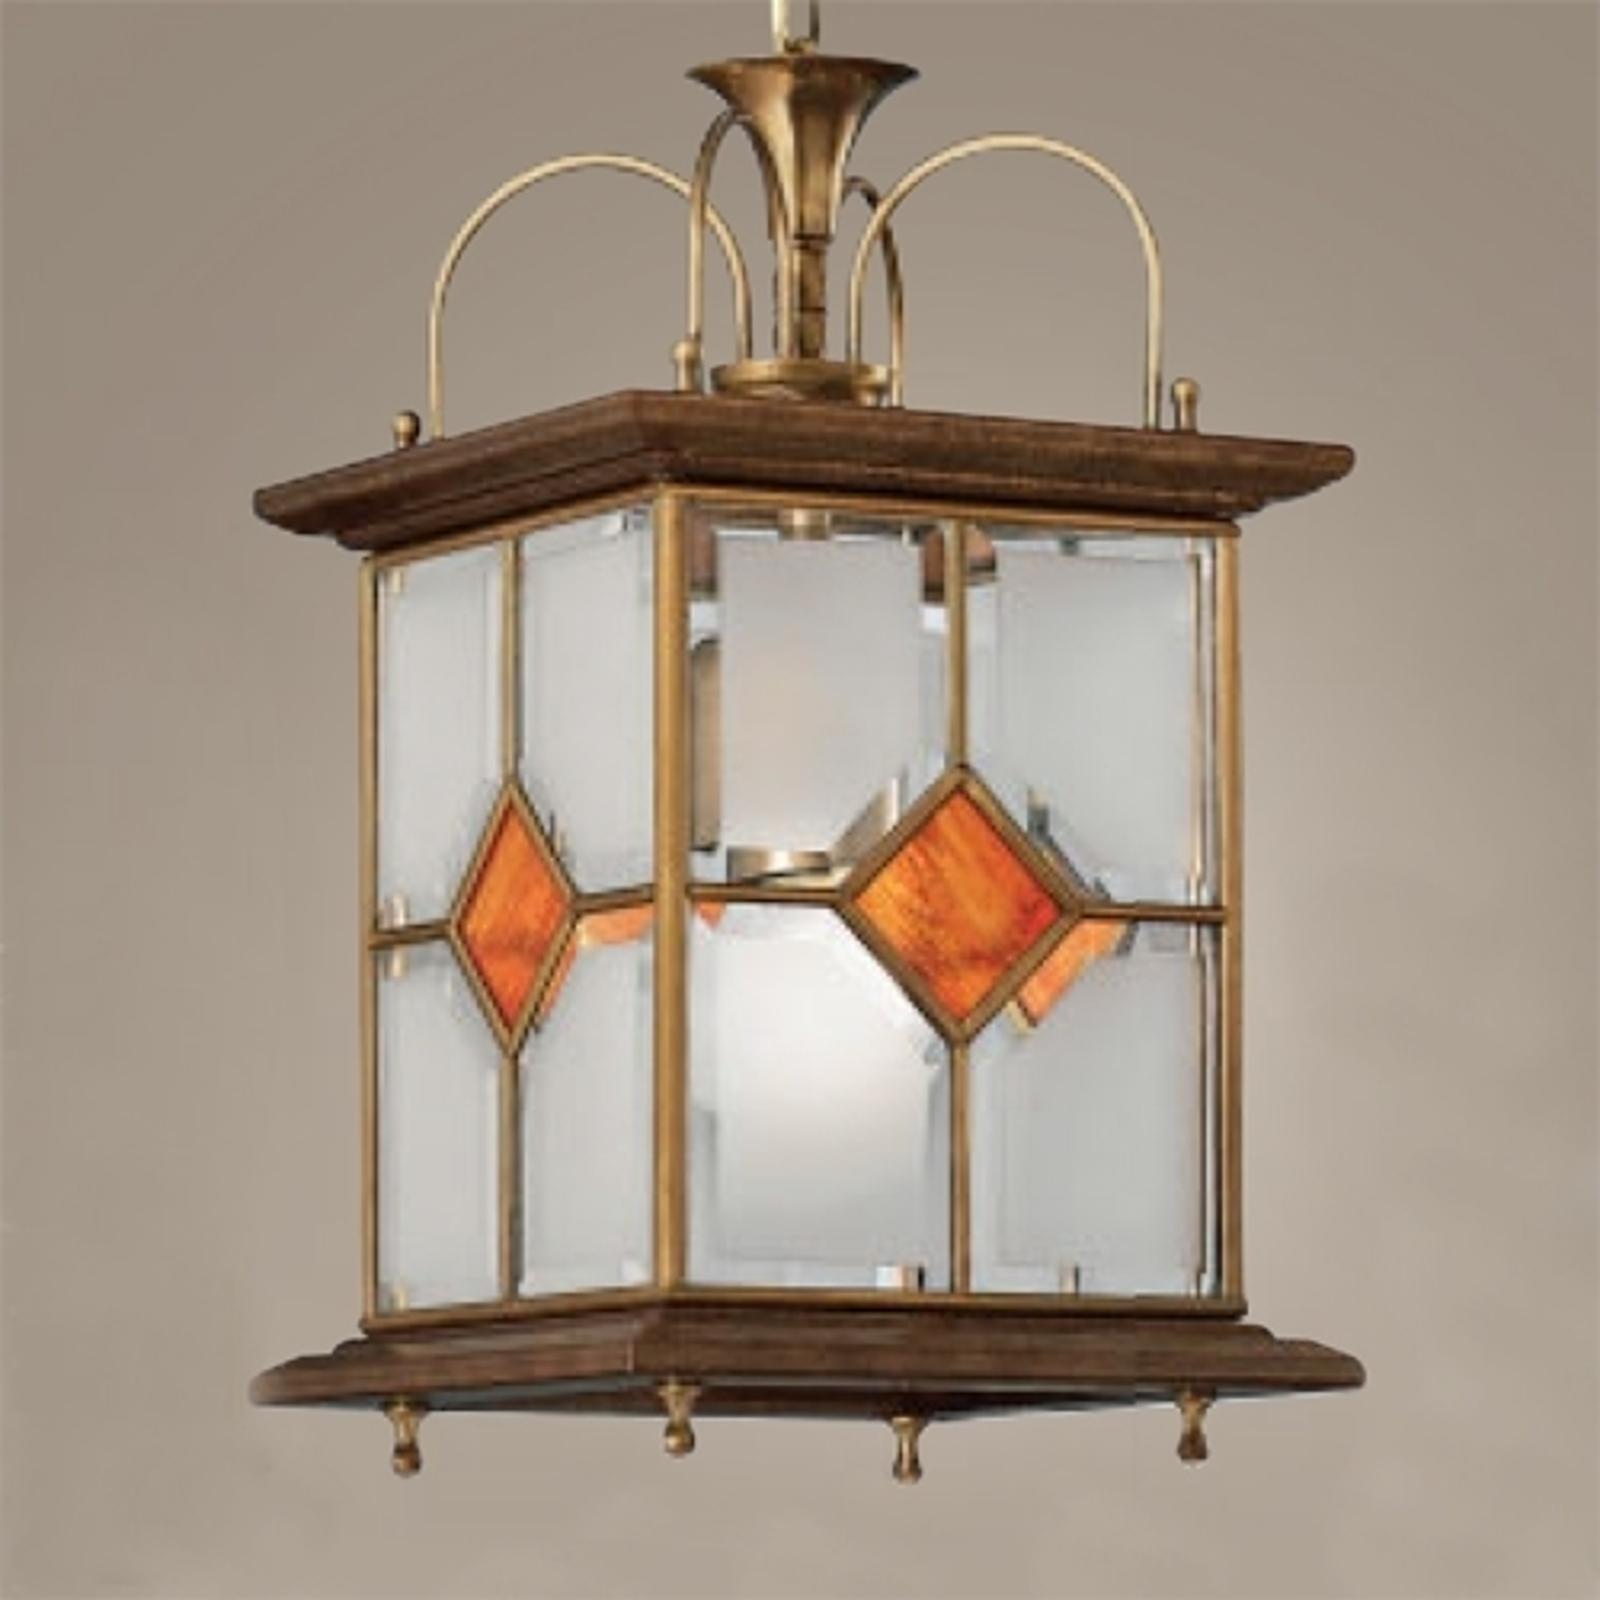 Houten hanglamp Ole